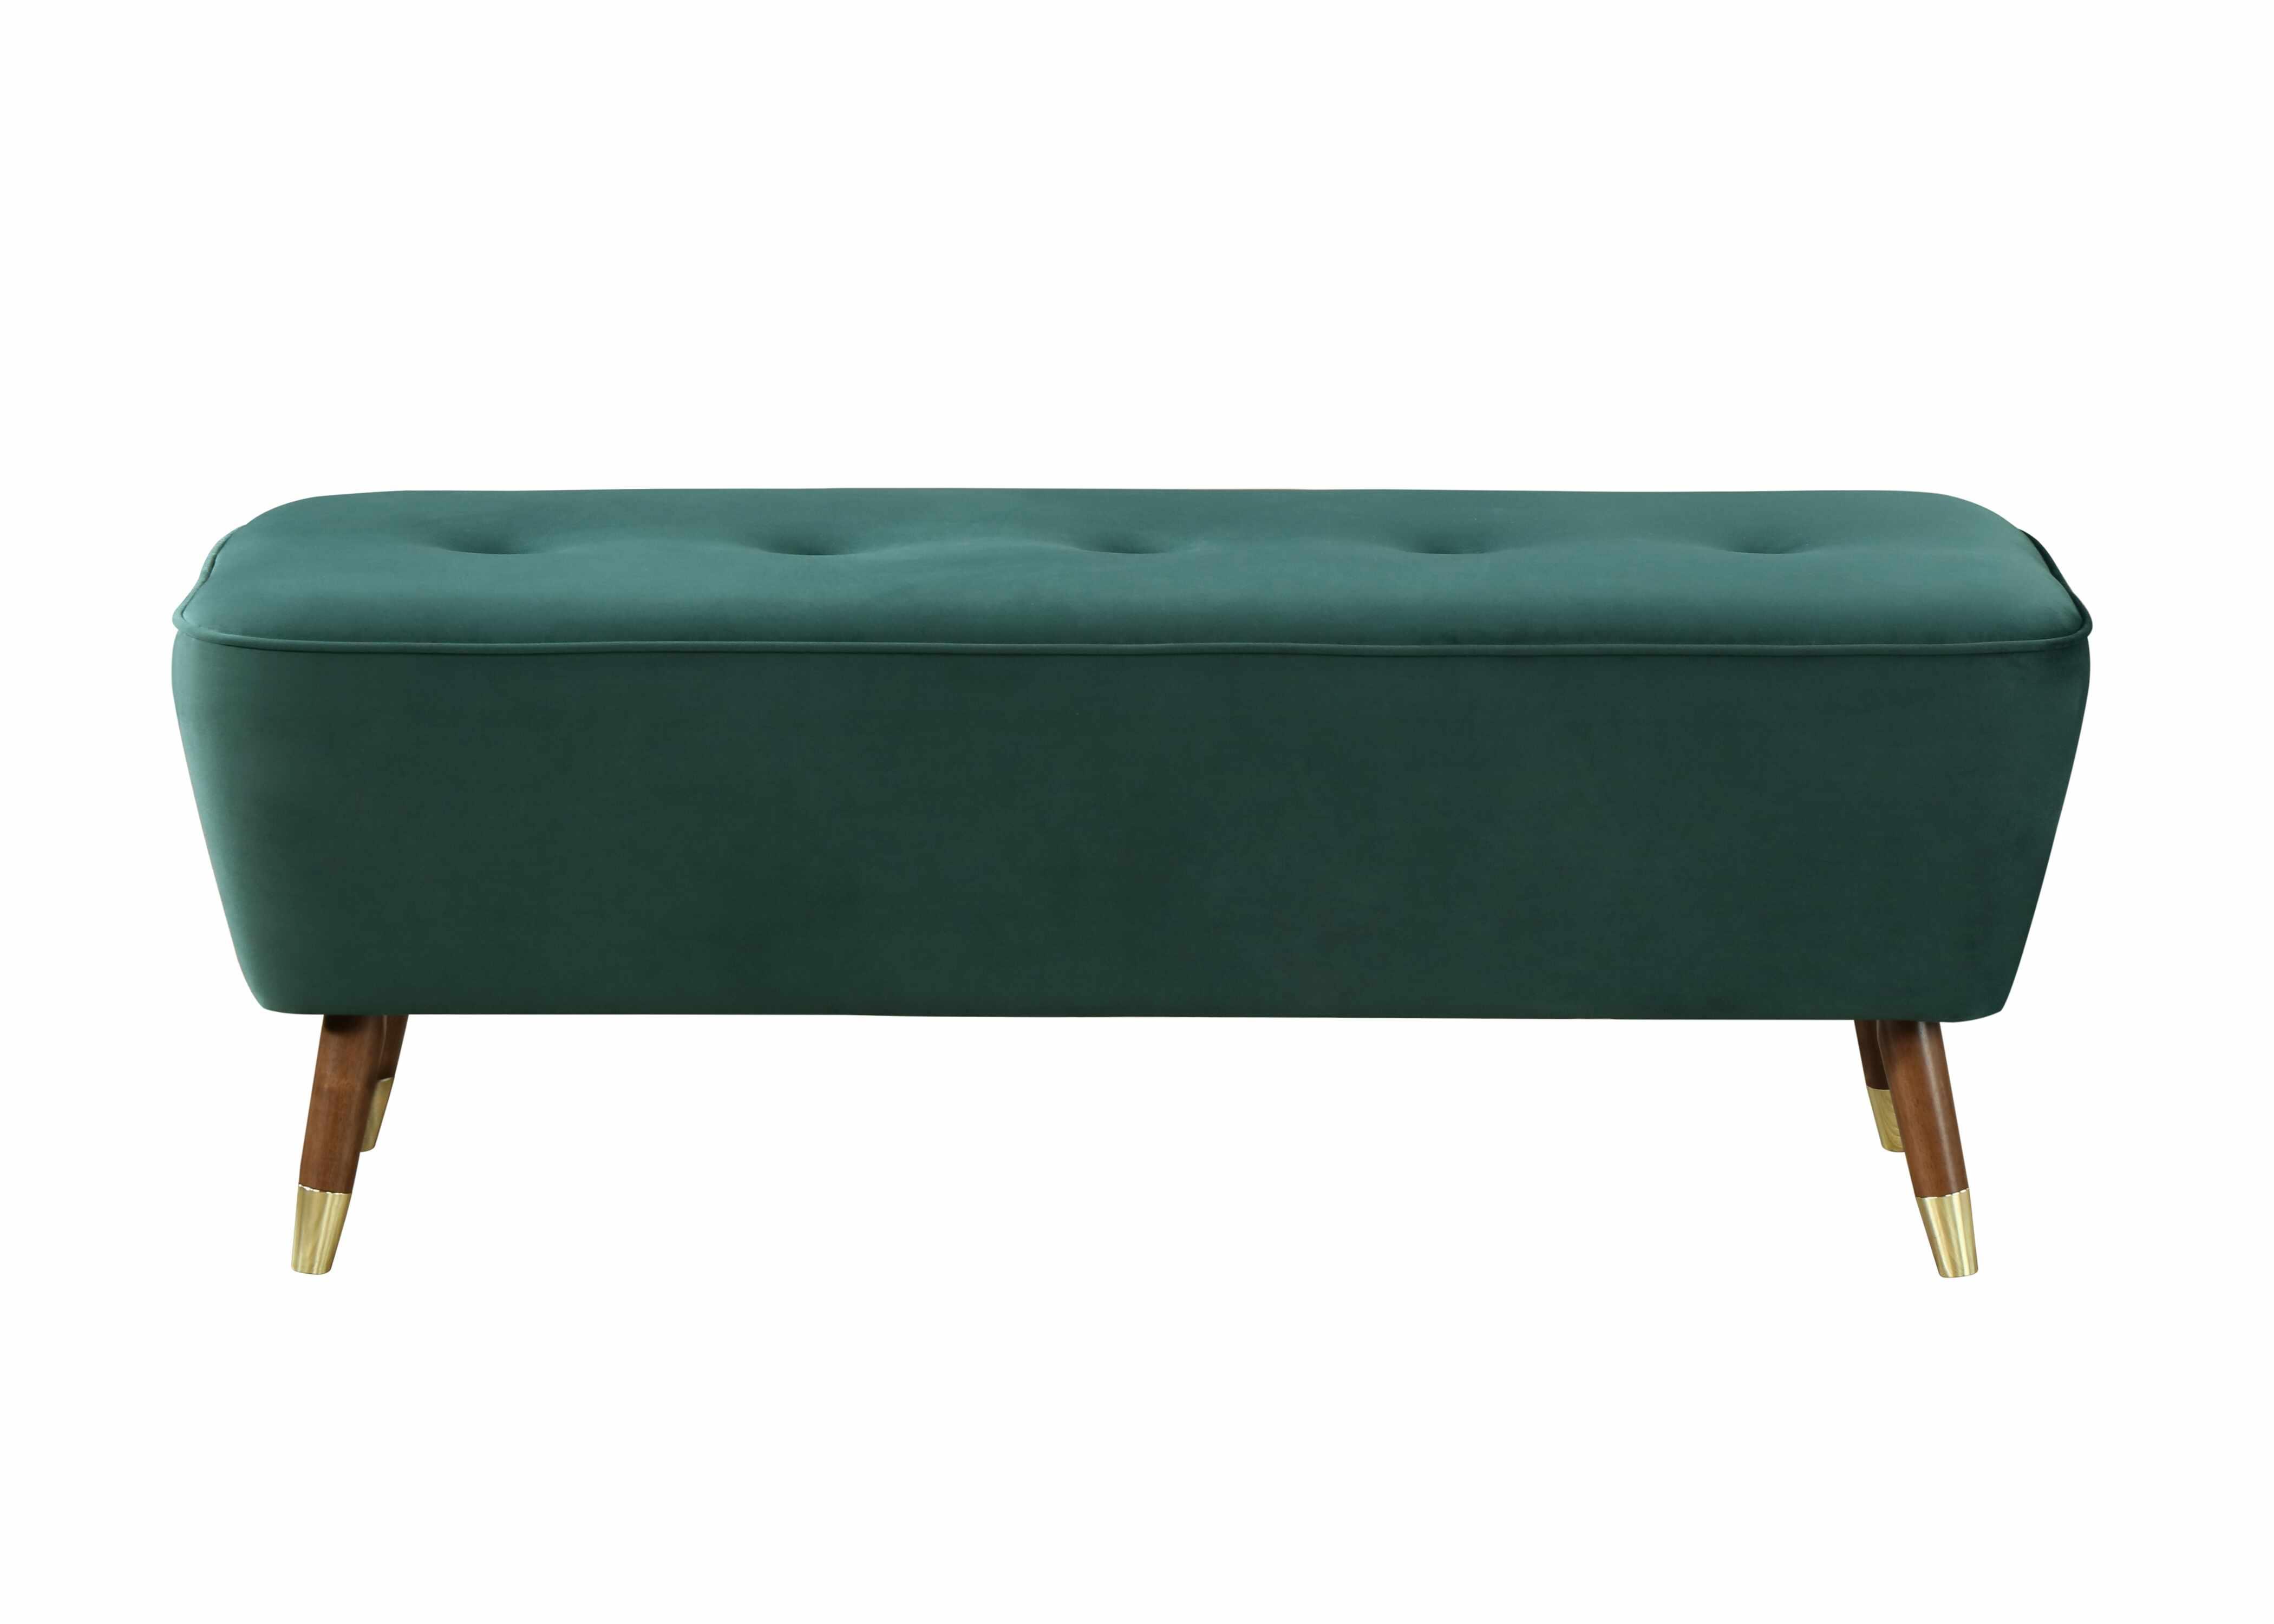 Banca tapitata cu stofa si picioare din lemn Palm Velvet Verde, l125xA47,5xH46,5 cm la pret 856 lei